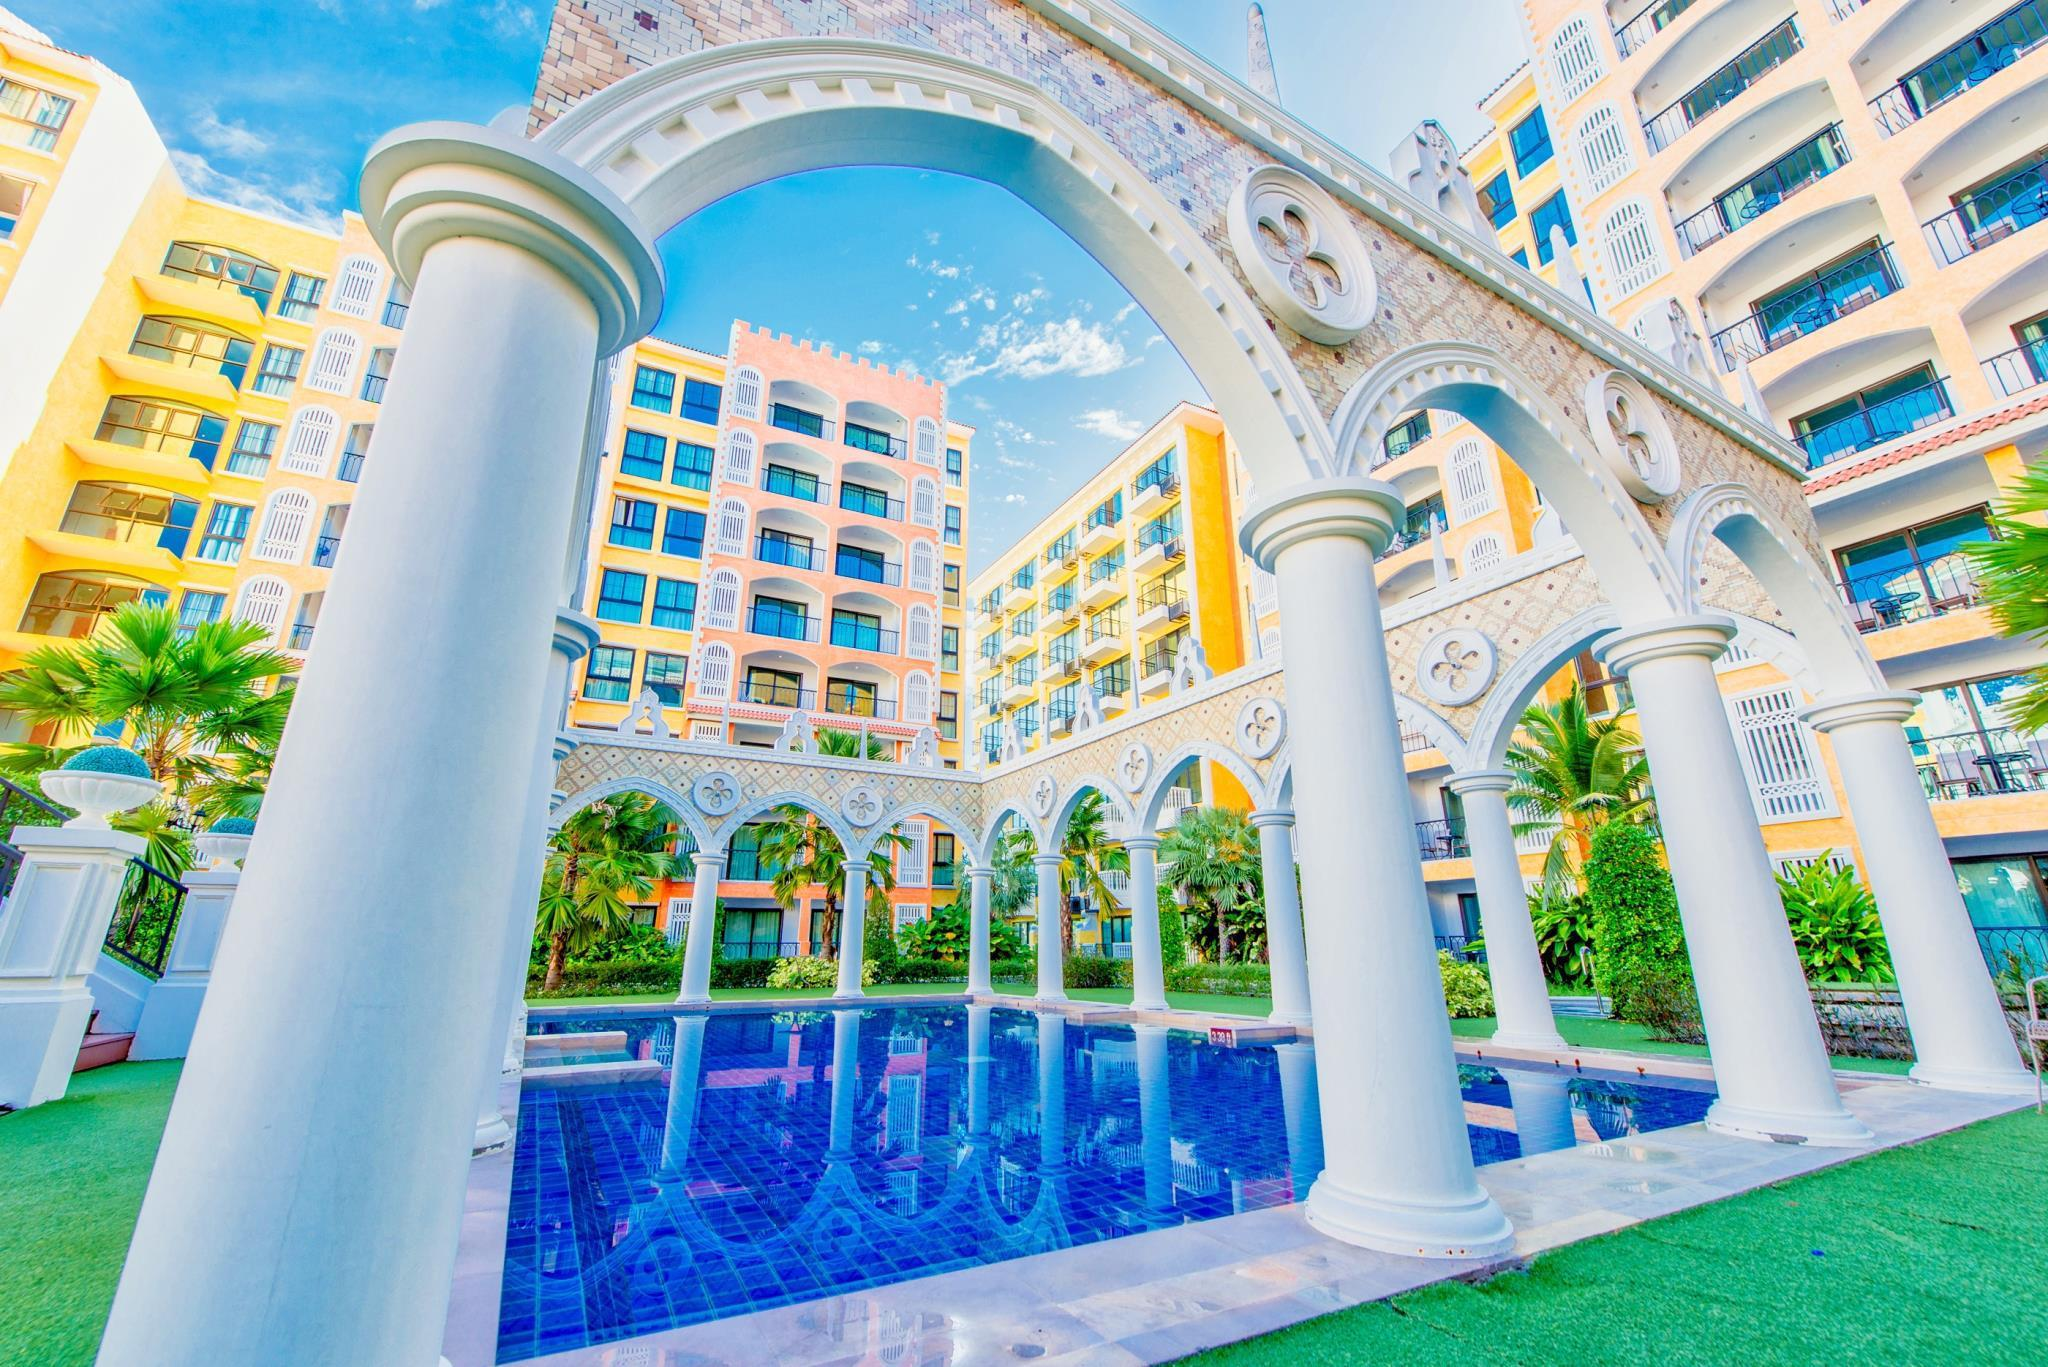 Venetian Resort Jomtien เวเนเชียน รีสอร์ต จอมเทียน